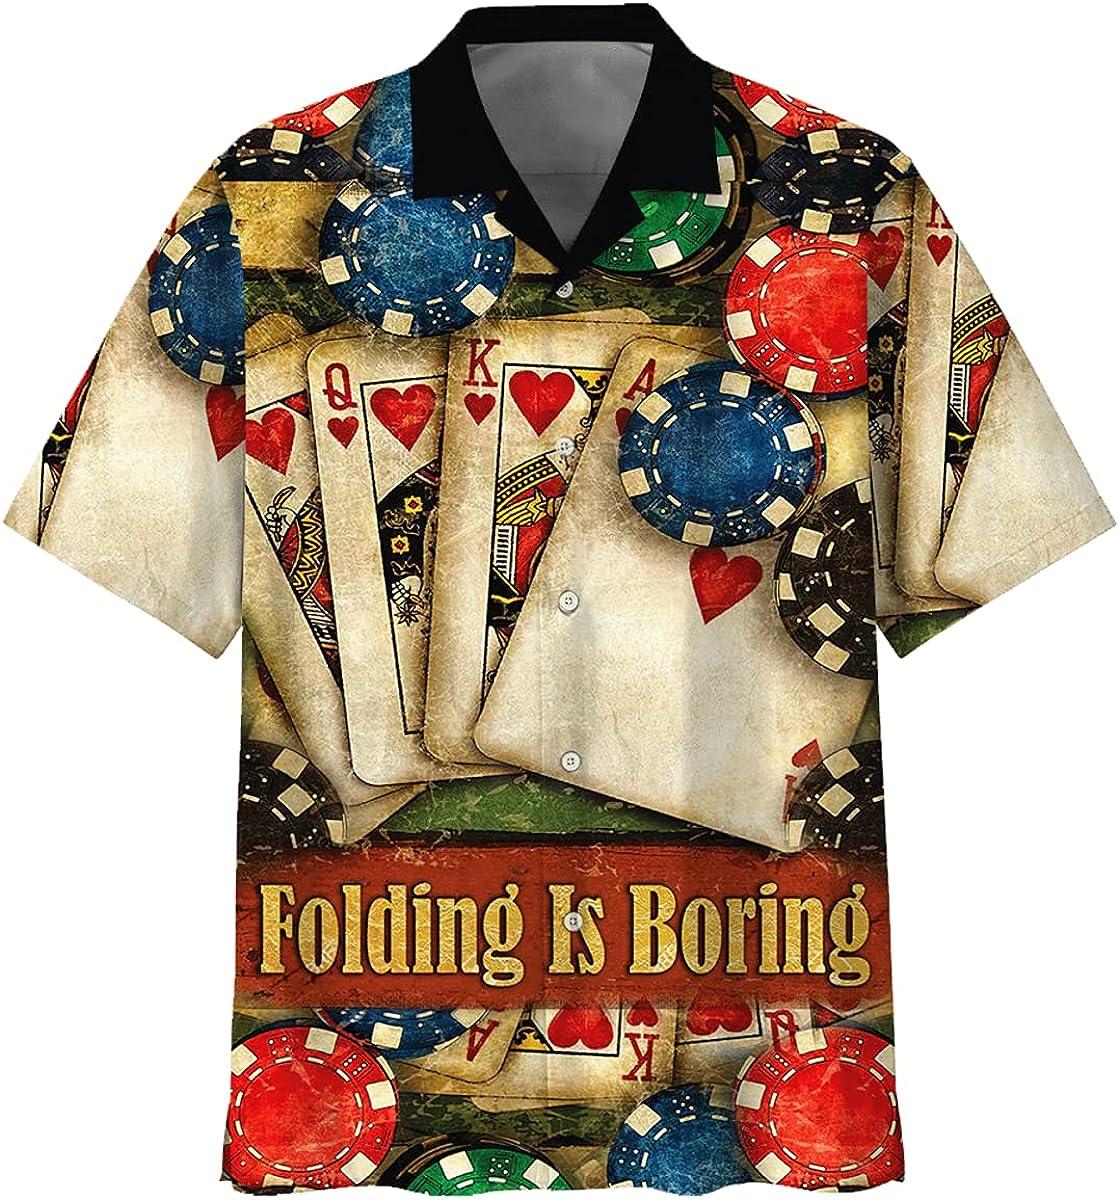 Poker Faces Card Folding is Boring Unisex Hawaiian Shirt, Beach Shorts for Summer Holiday Full Size 3XL, 4XL, 5XL for Men and Women